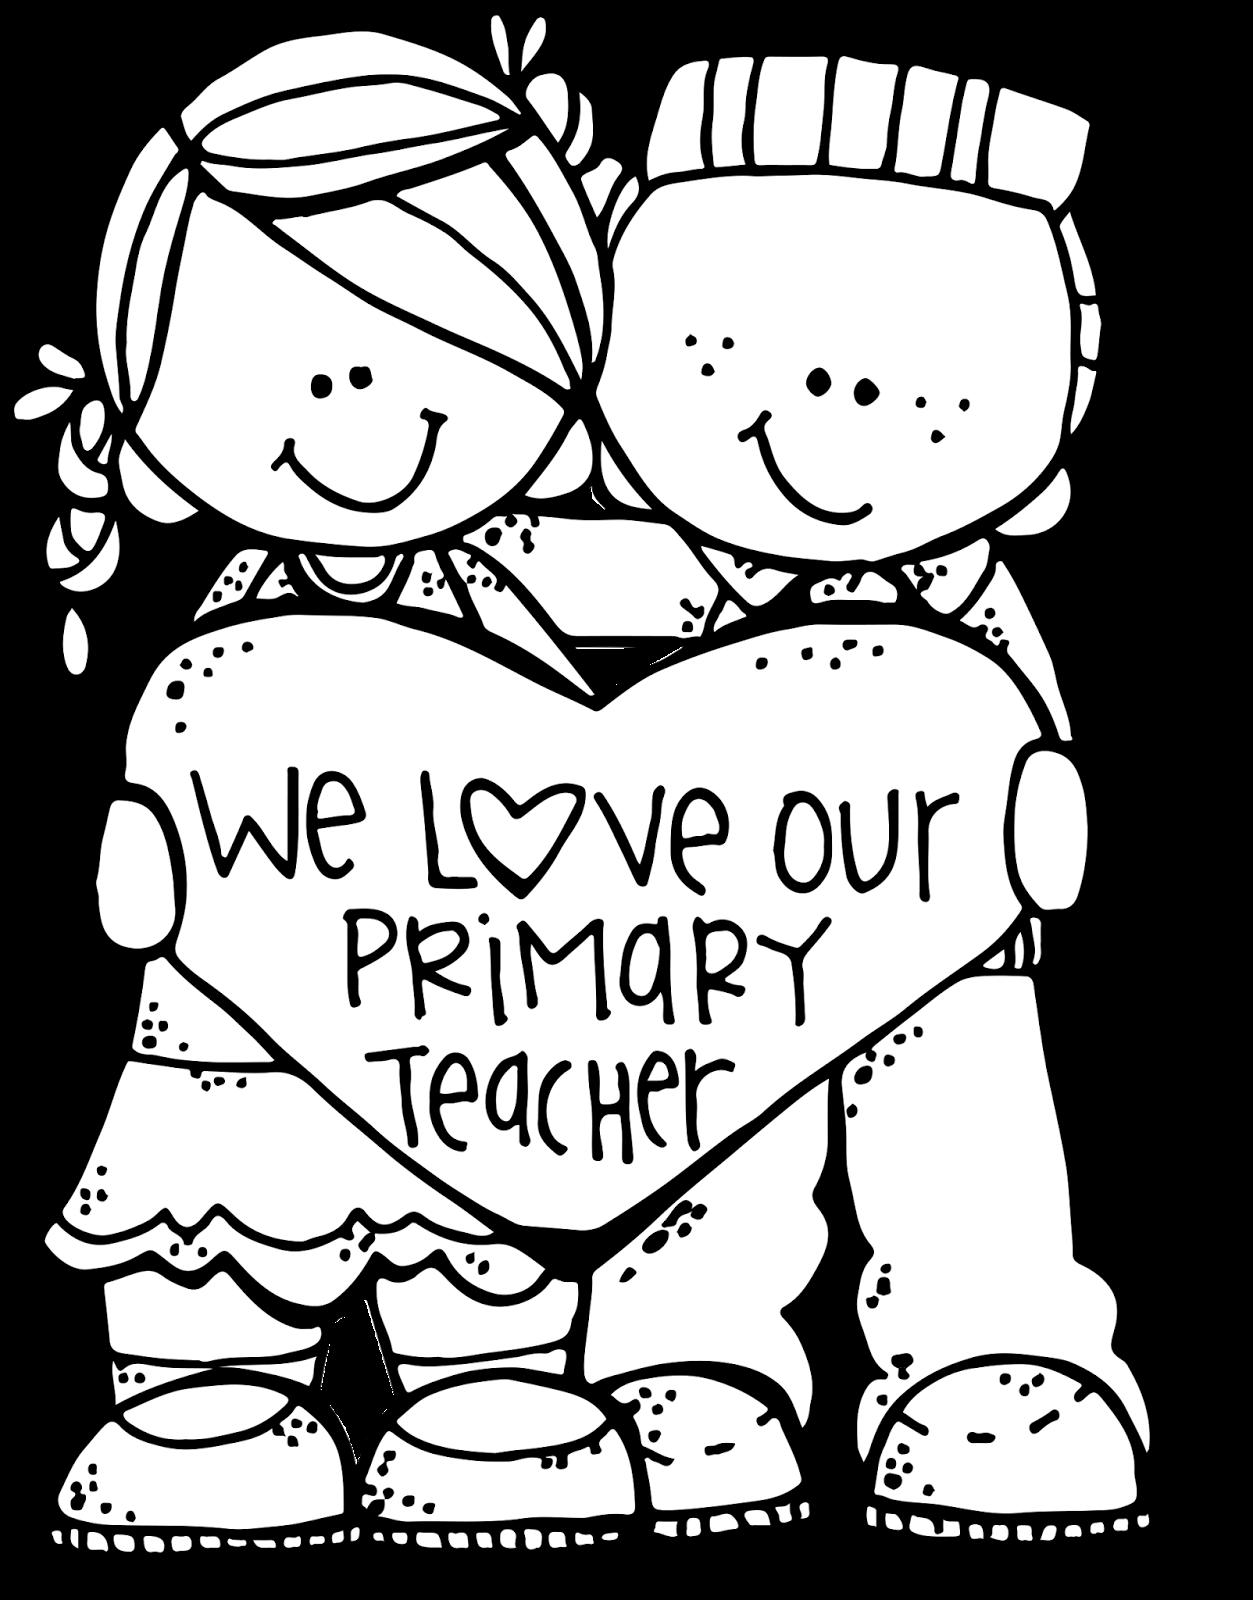 Elementary school clipart black and white banner download Love+Primary+teacher+MHLDSF+%28c%29+Melonheadz+Illustrating+LLC+2016 ... banner download